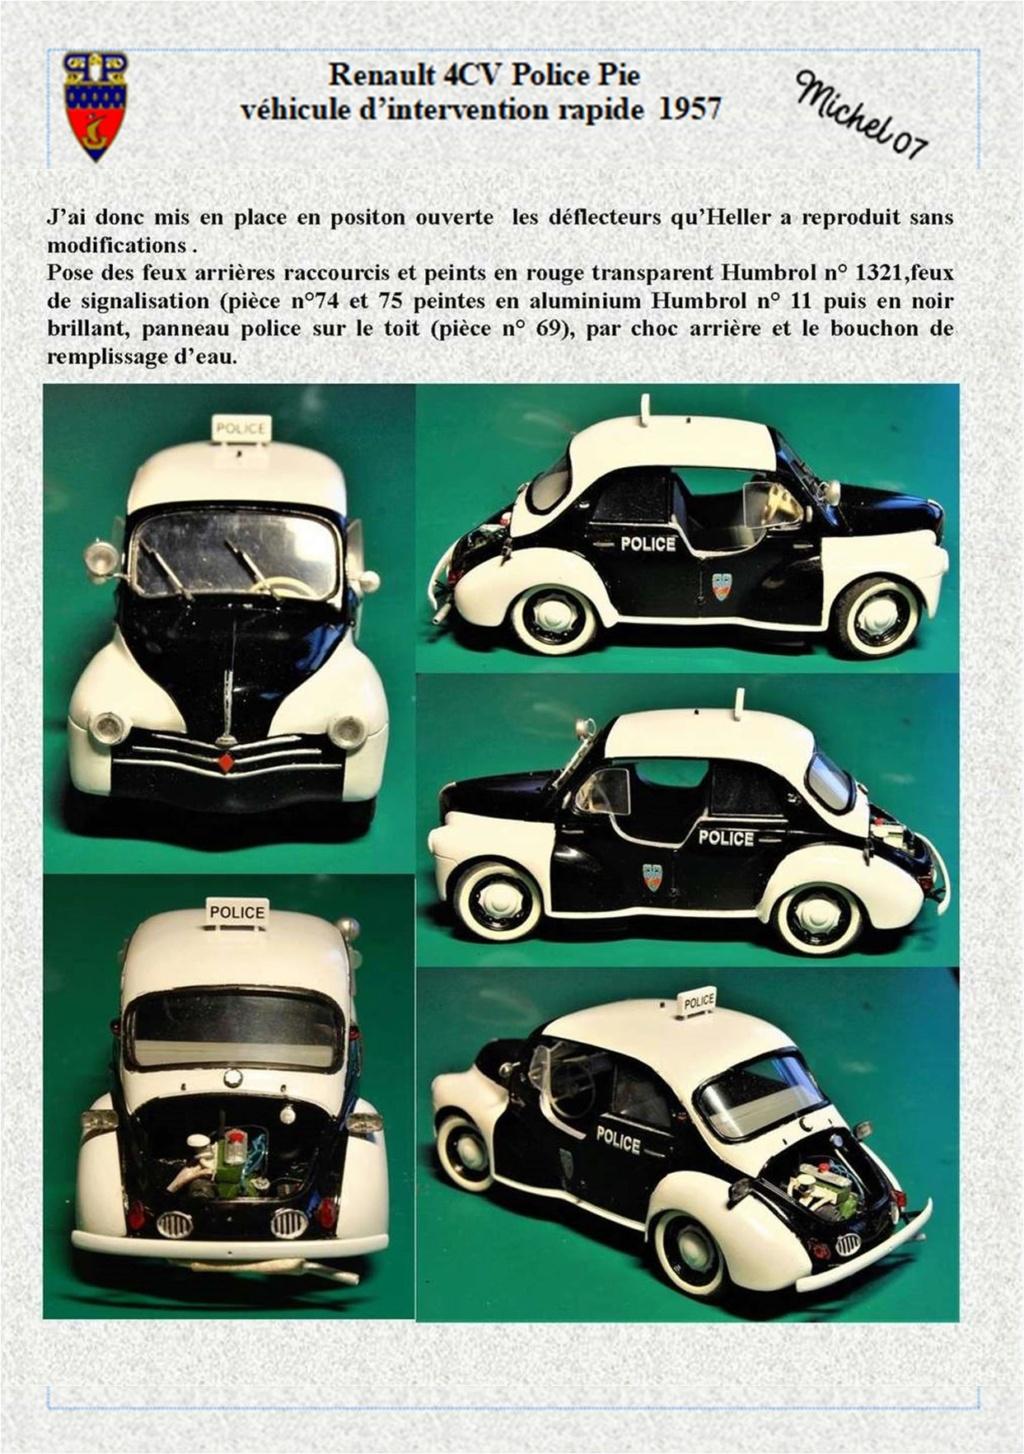 renault 4 cv pie 1957 Heller 1/24 (Terminé) Image422